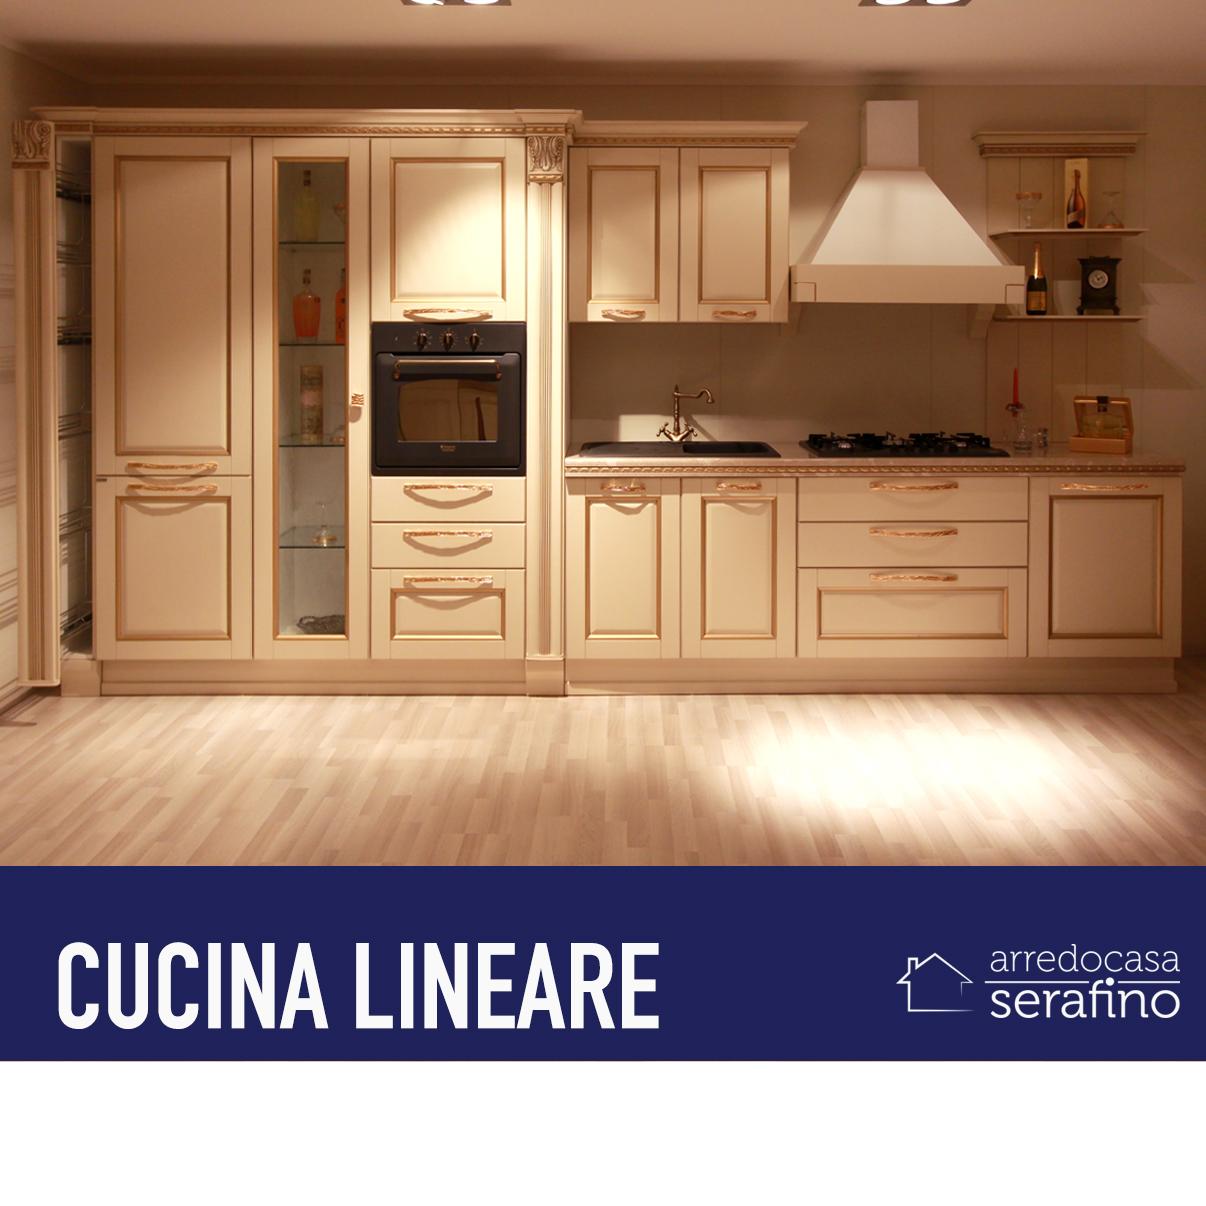 Arredo Casa Francavilla Fontana cucina lineare 03.